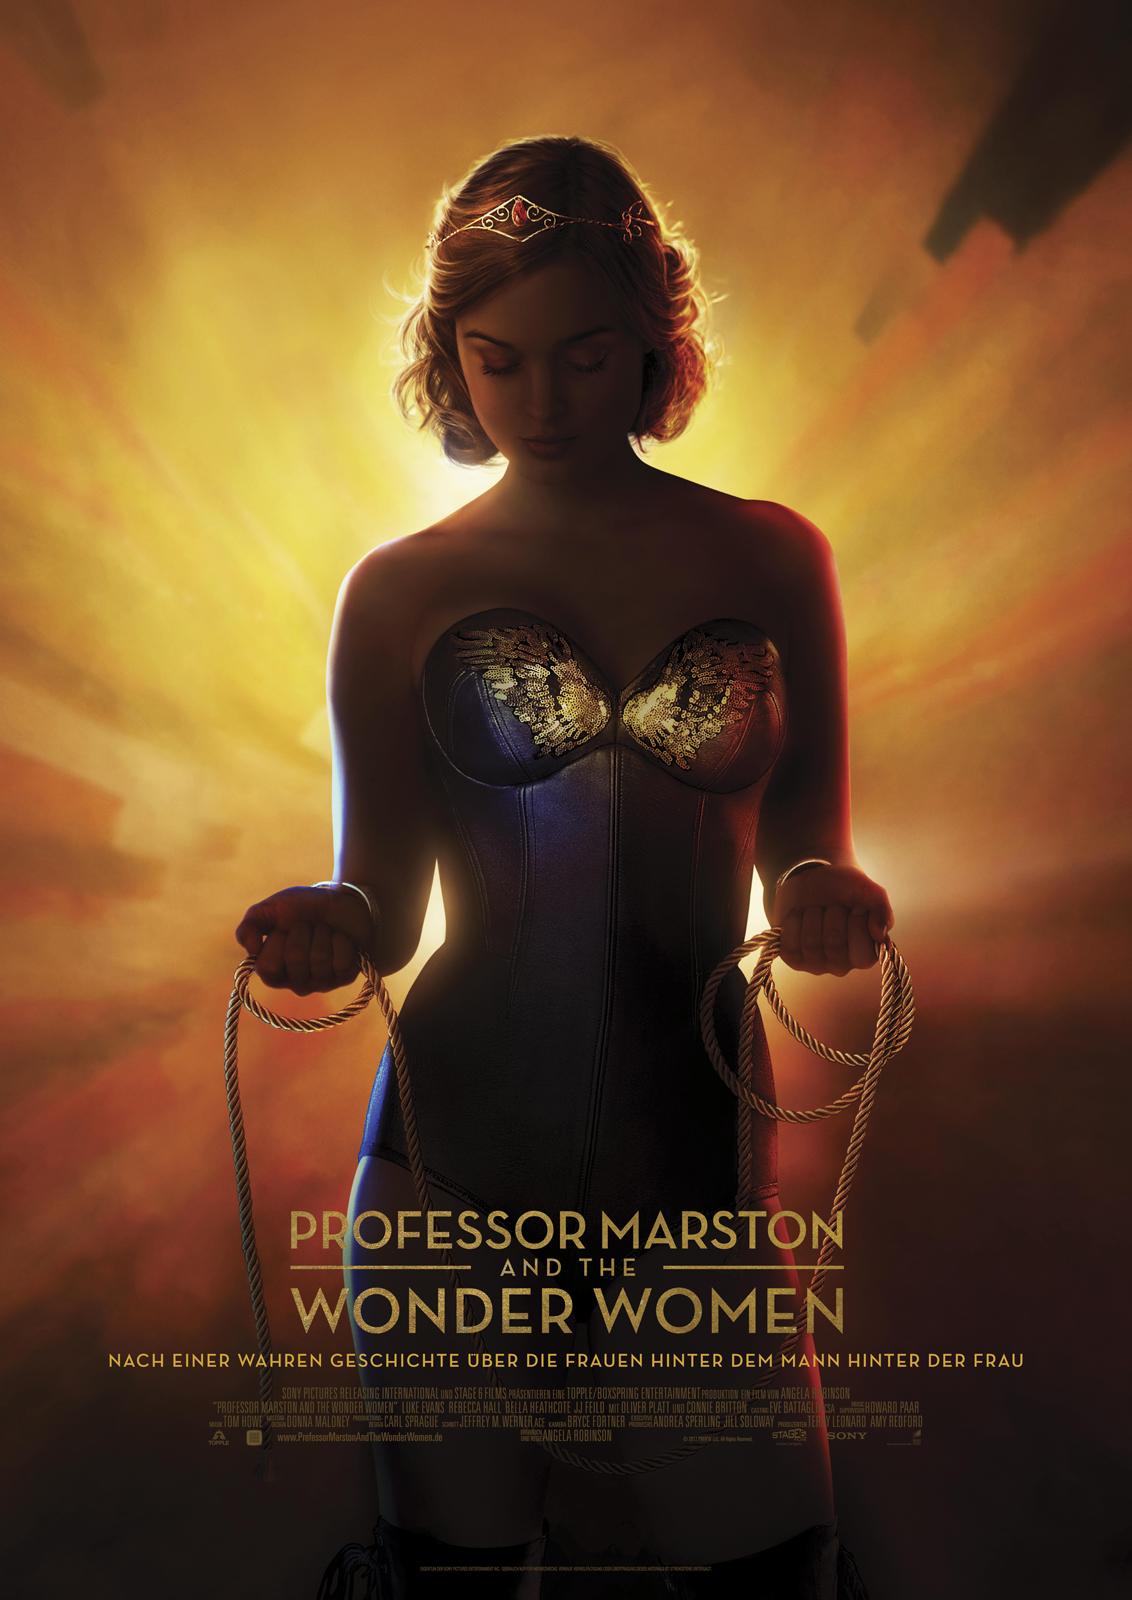 Marston Wonder Woman